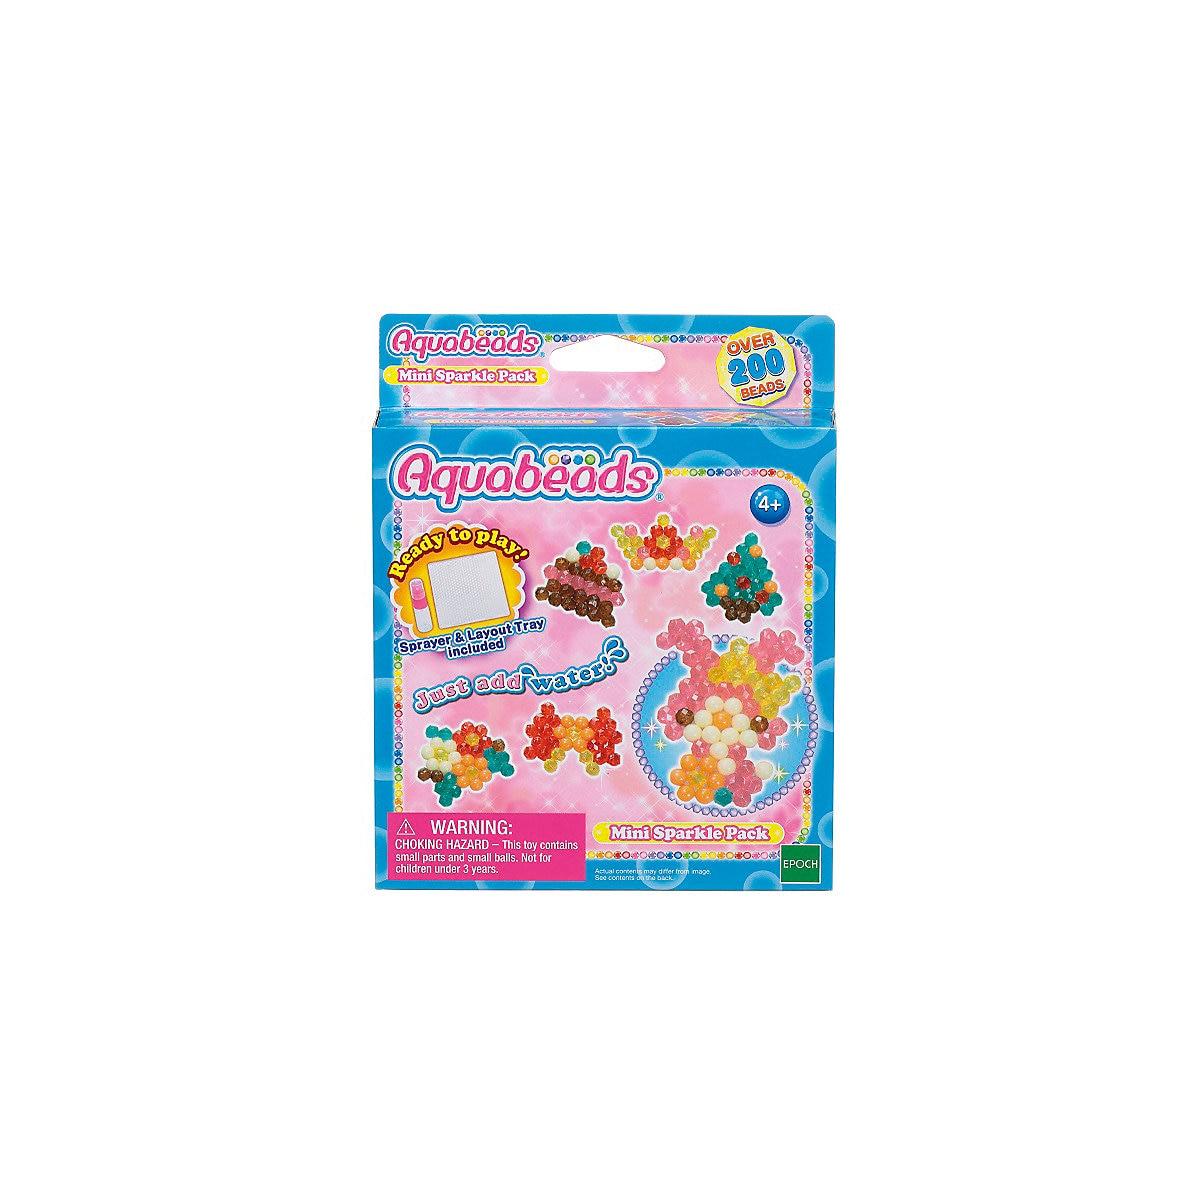 Aquabeads Beads Toys 7236014 Creativity Needlework For Children Set Kids Toy Hobbis Arts Crafts DIY MTpromo